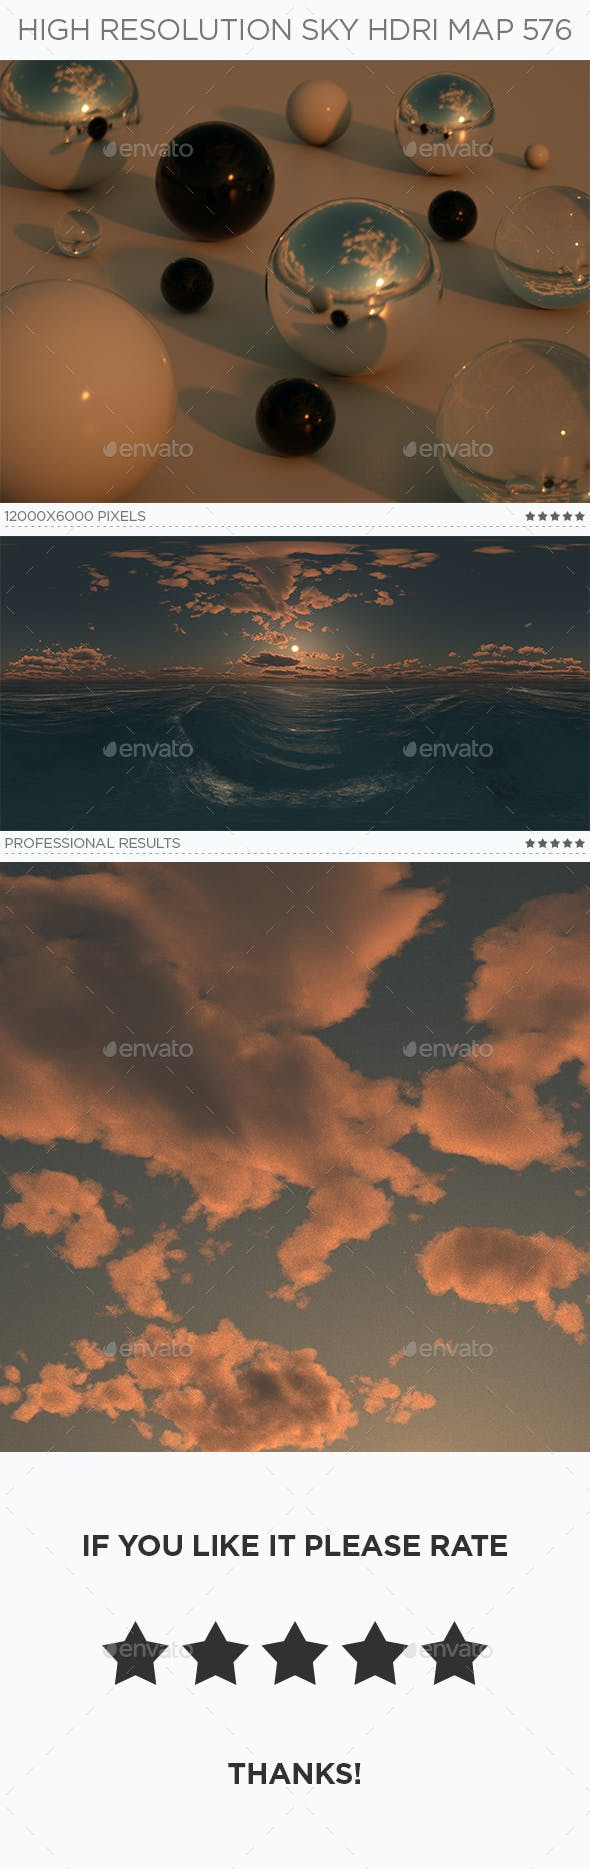 High Resolution Sky HDRi Map 576 - 3DOcean Item for Sale